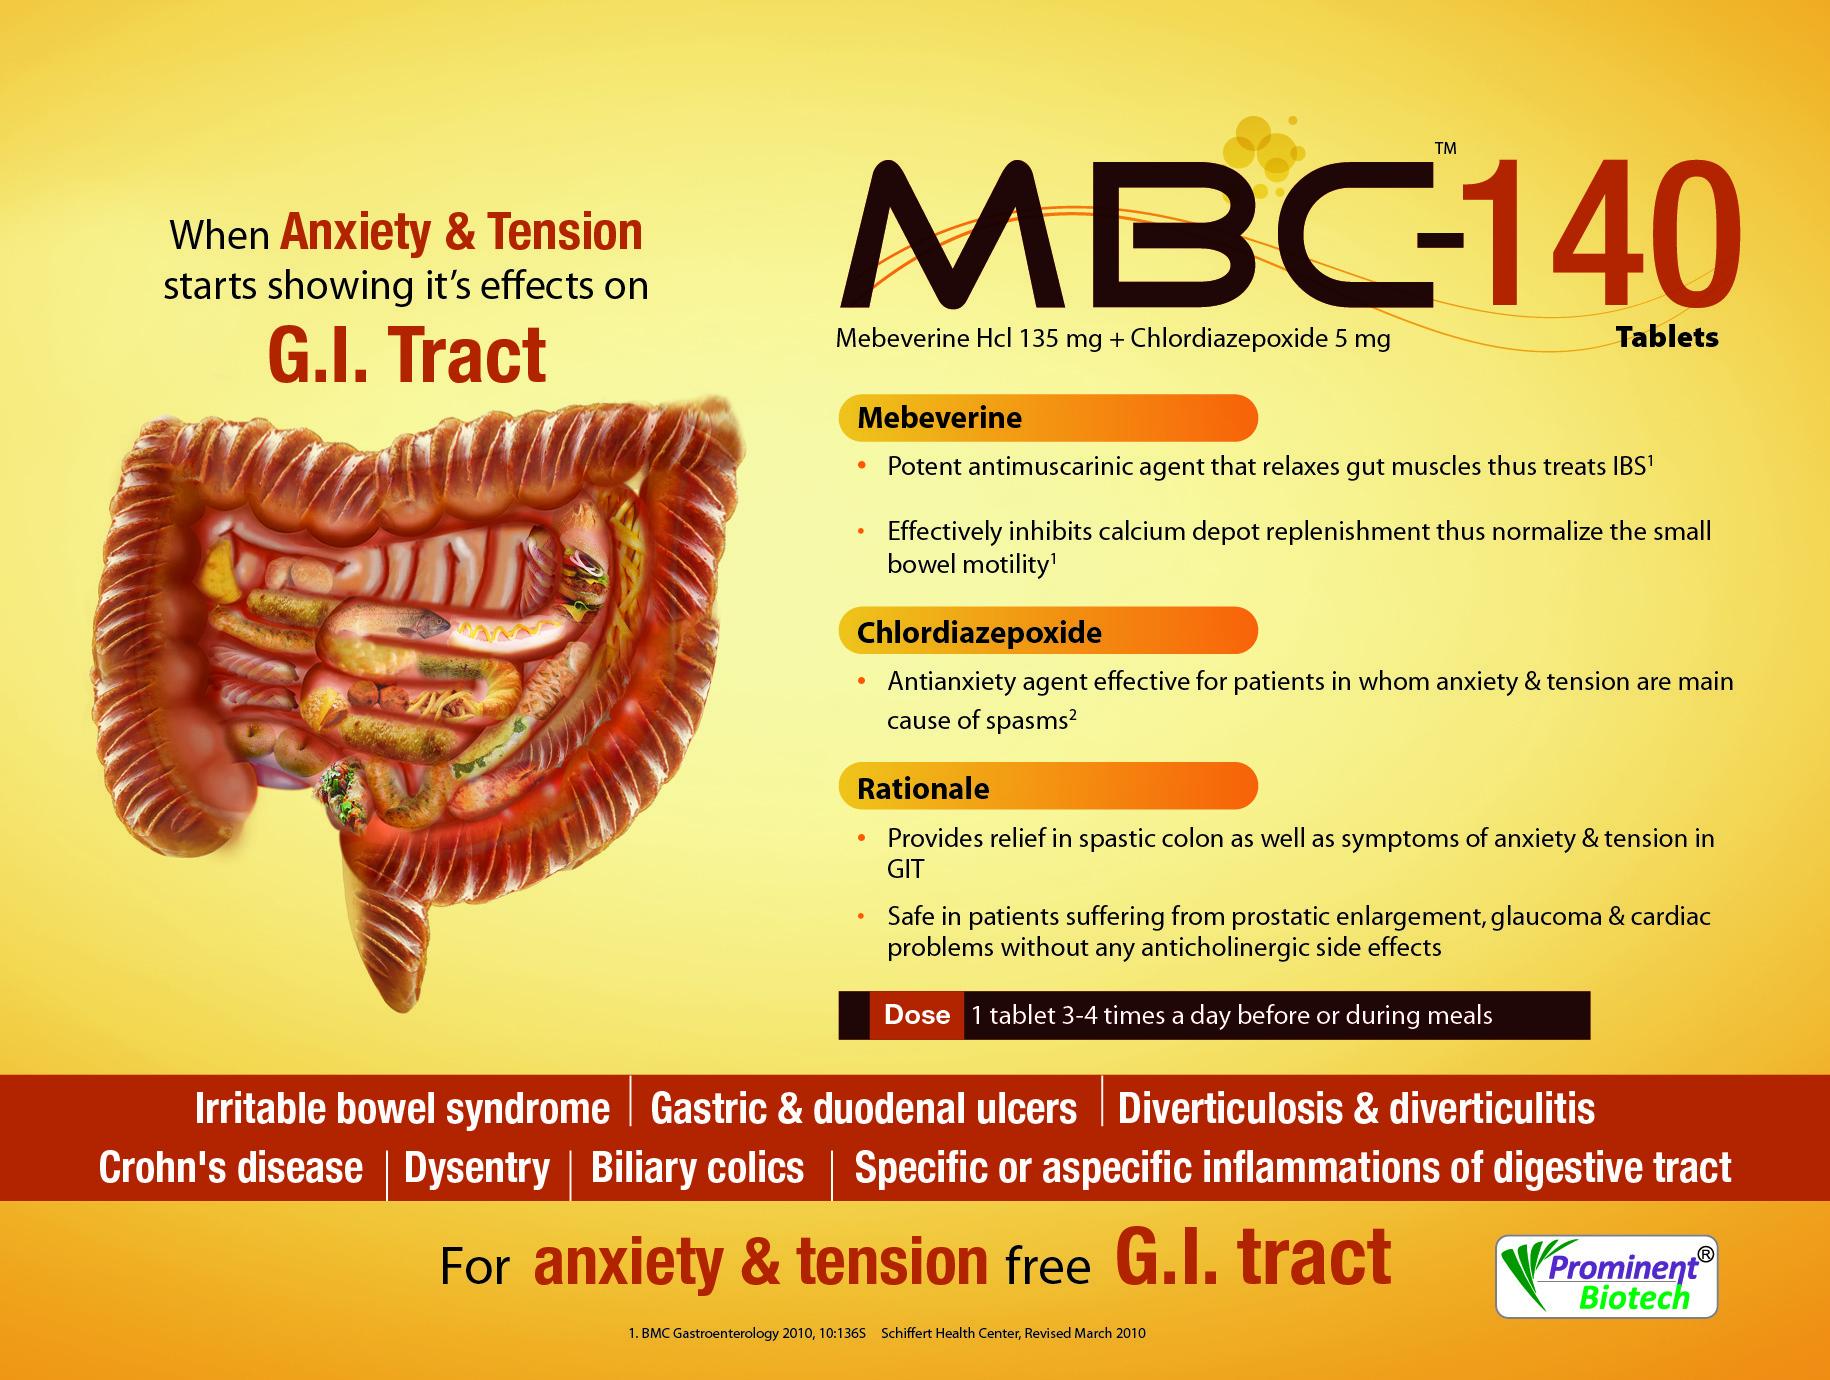 Mebeverine 135 mg & Chlordiazepoxide 5 mg